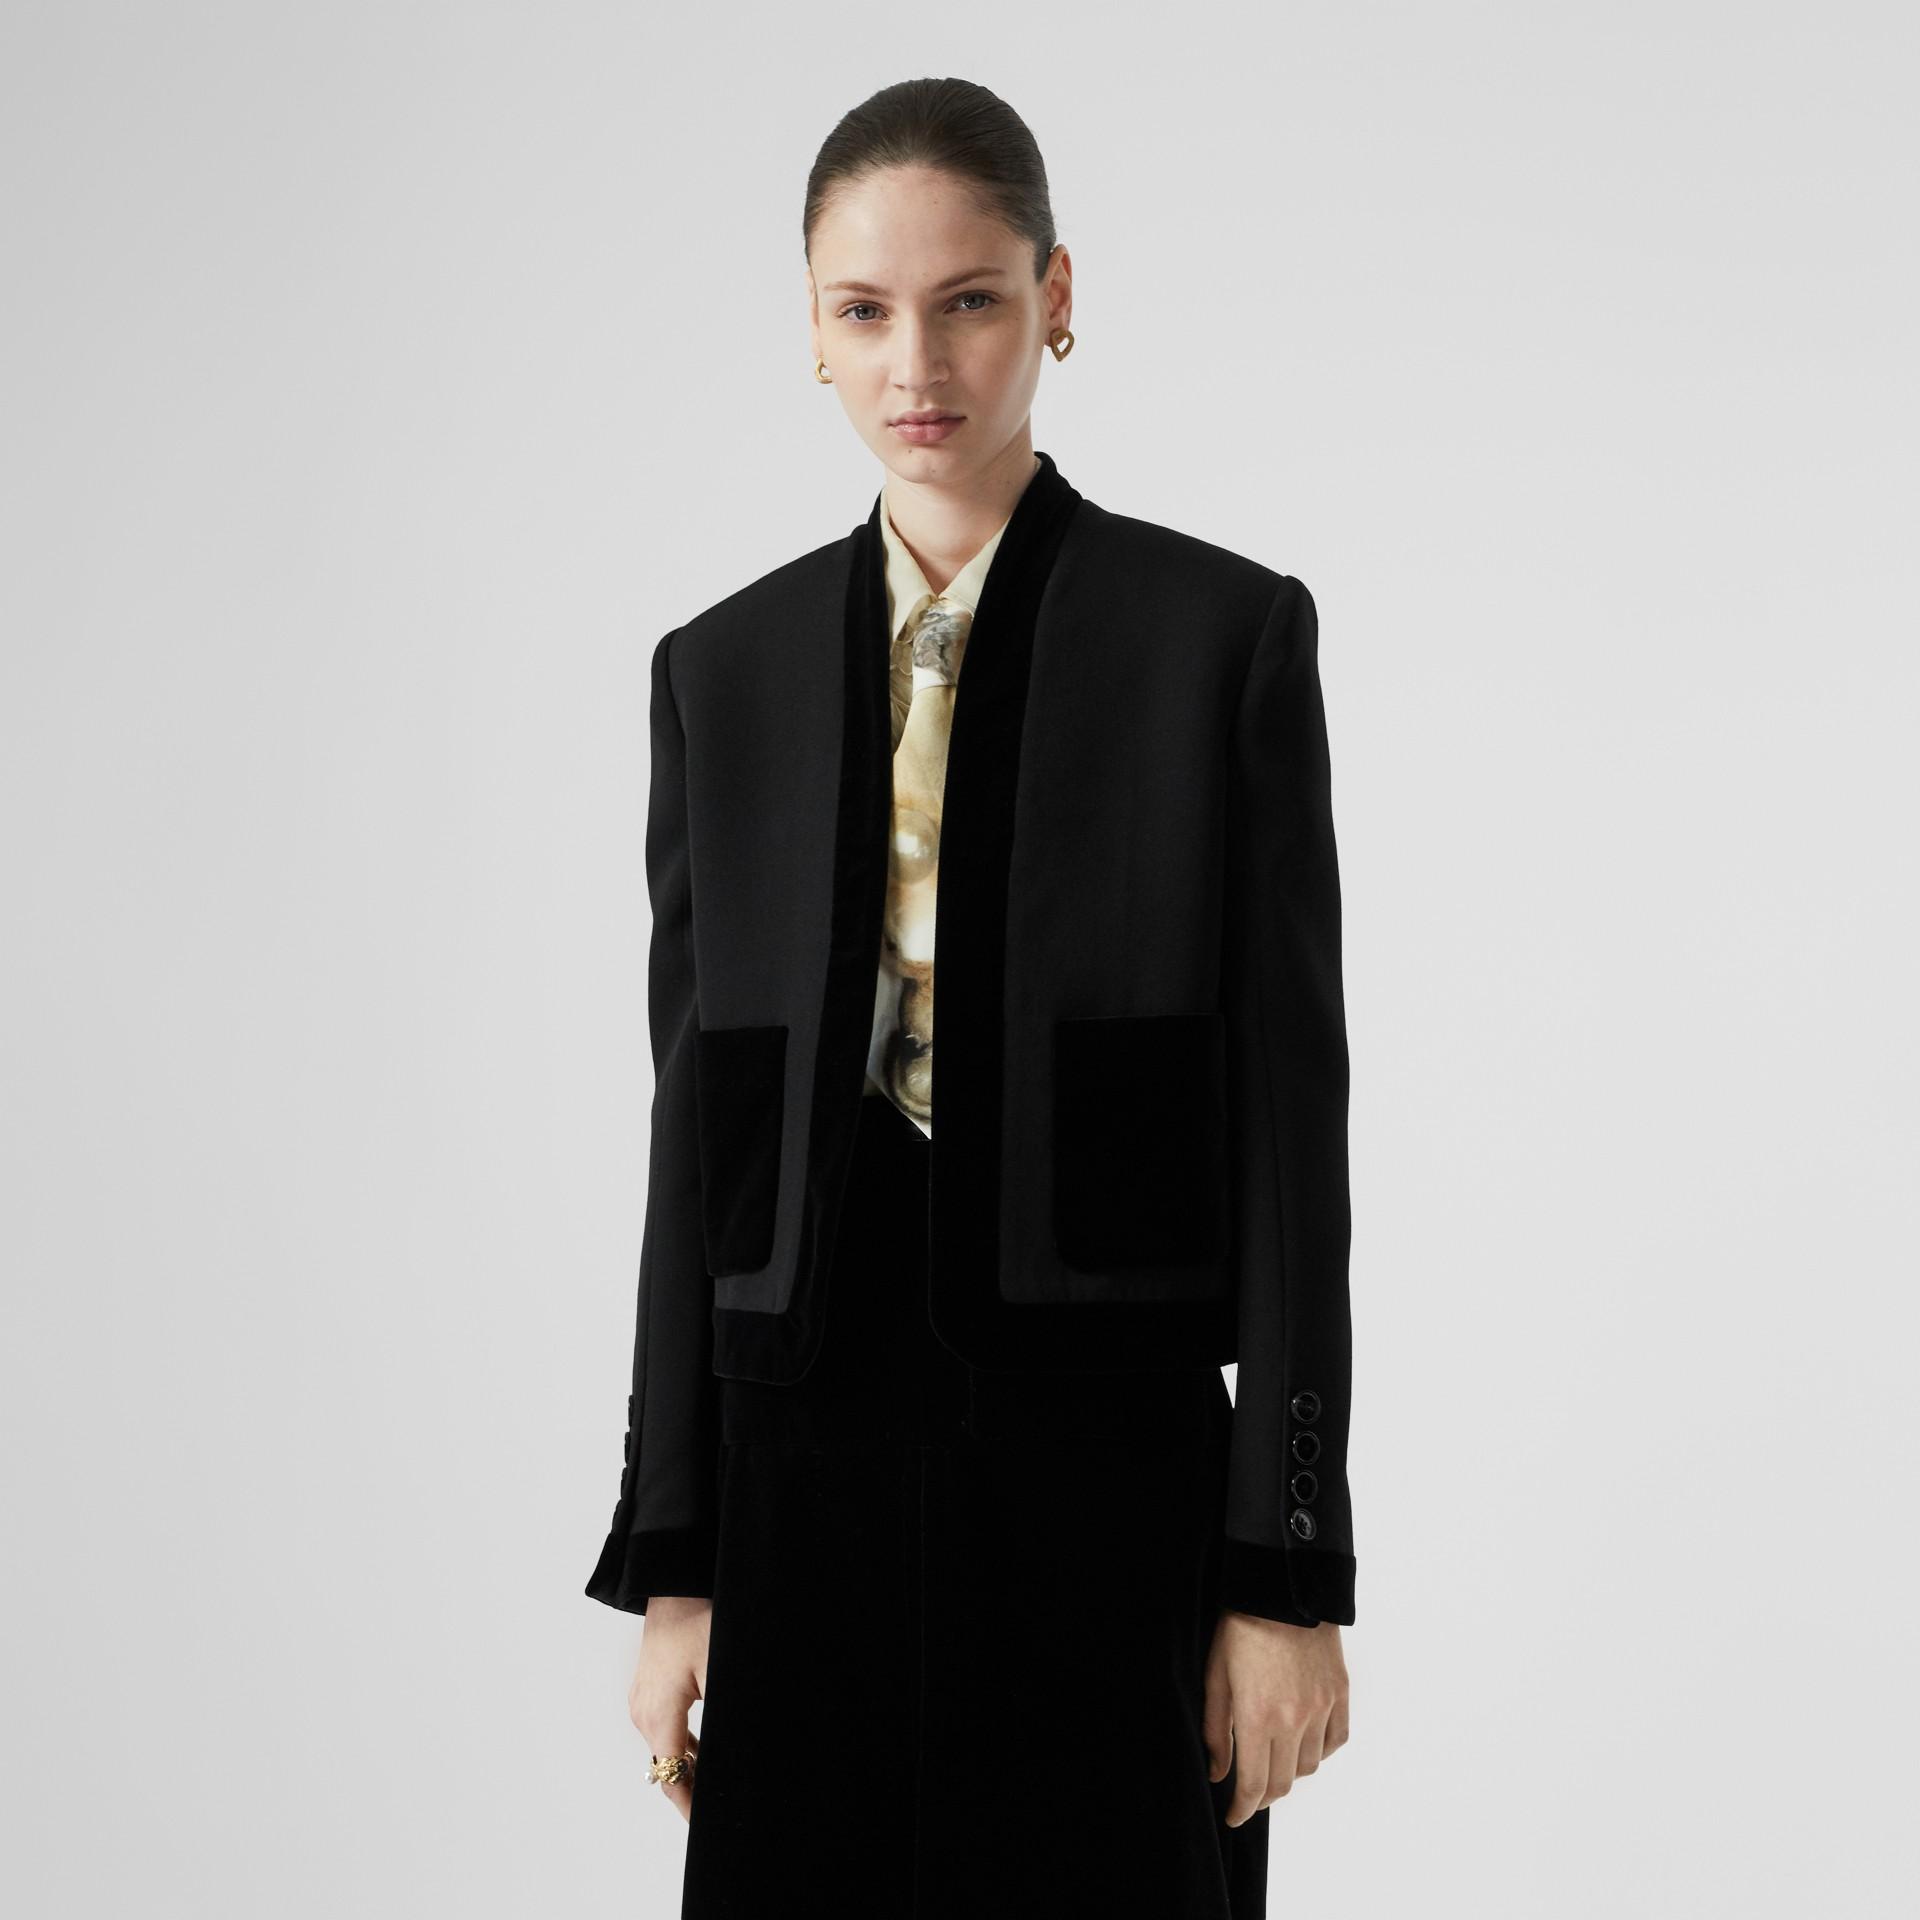 Velvet Detail Wool Tailored Jacket in Black - Women | Burberry - gallery image 5